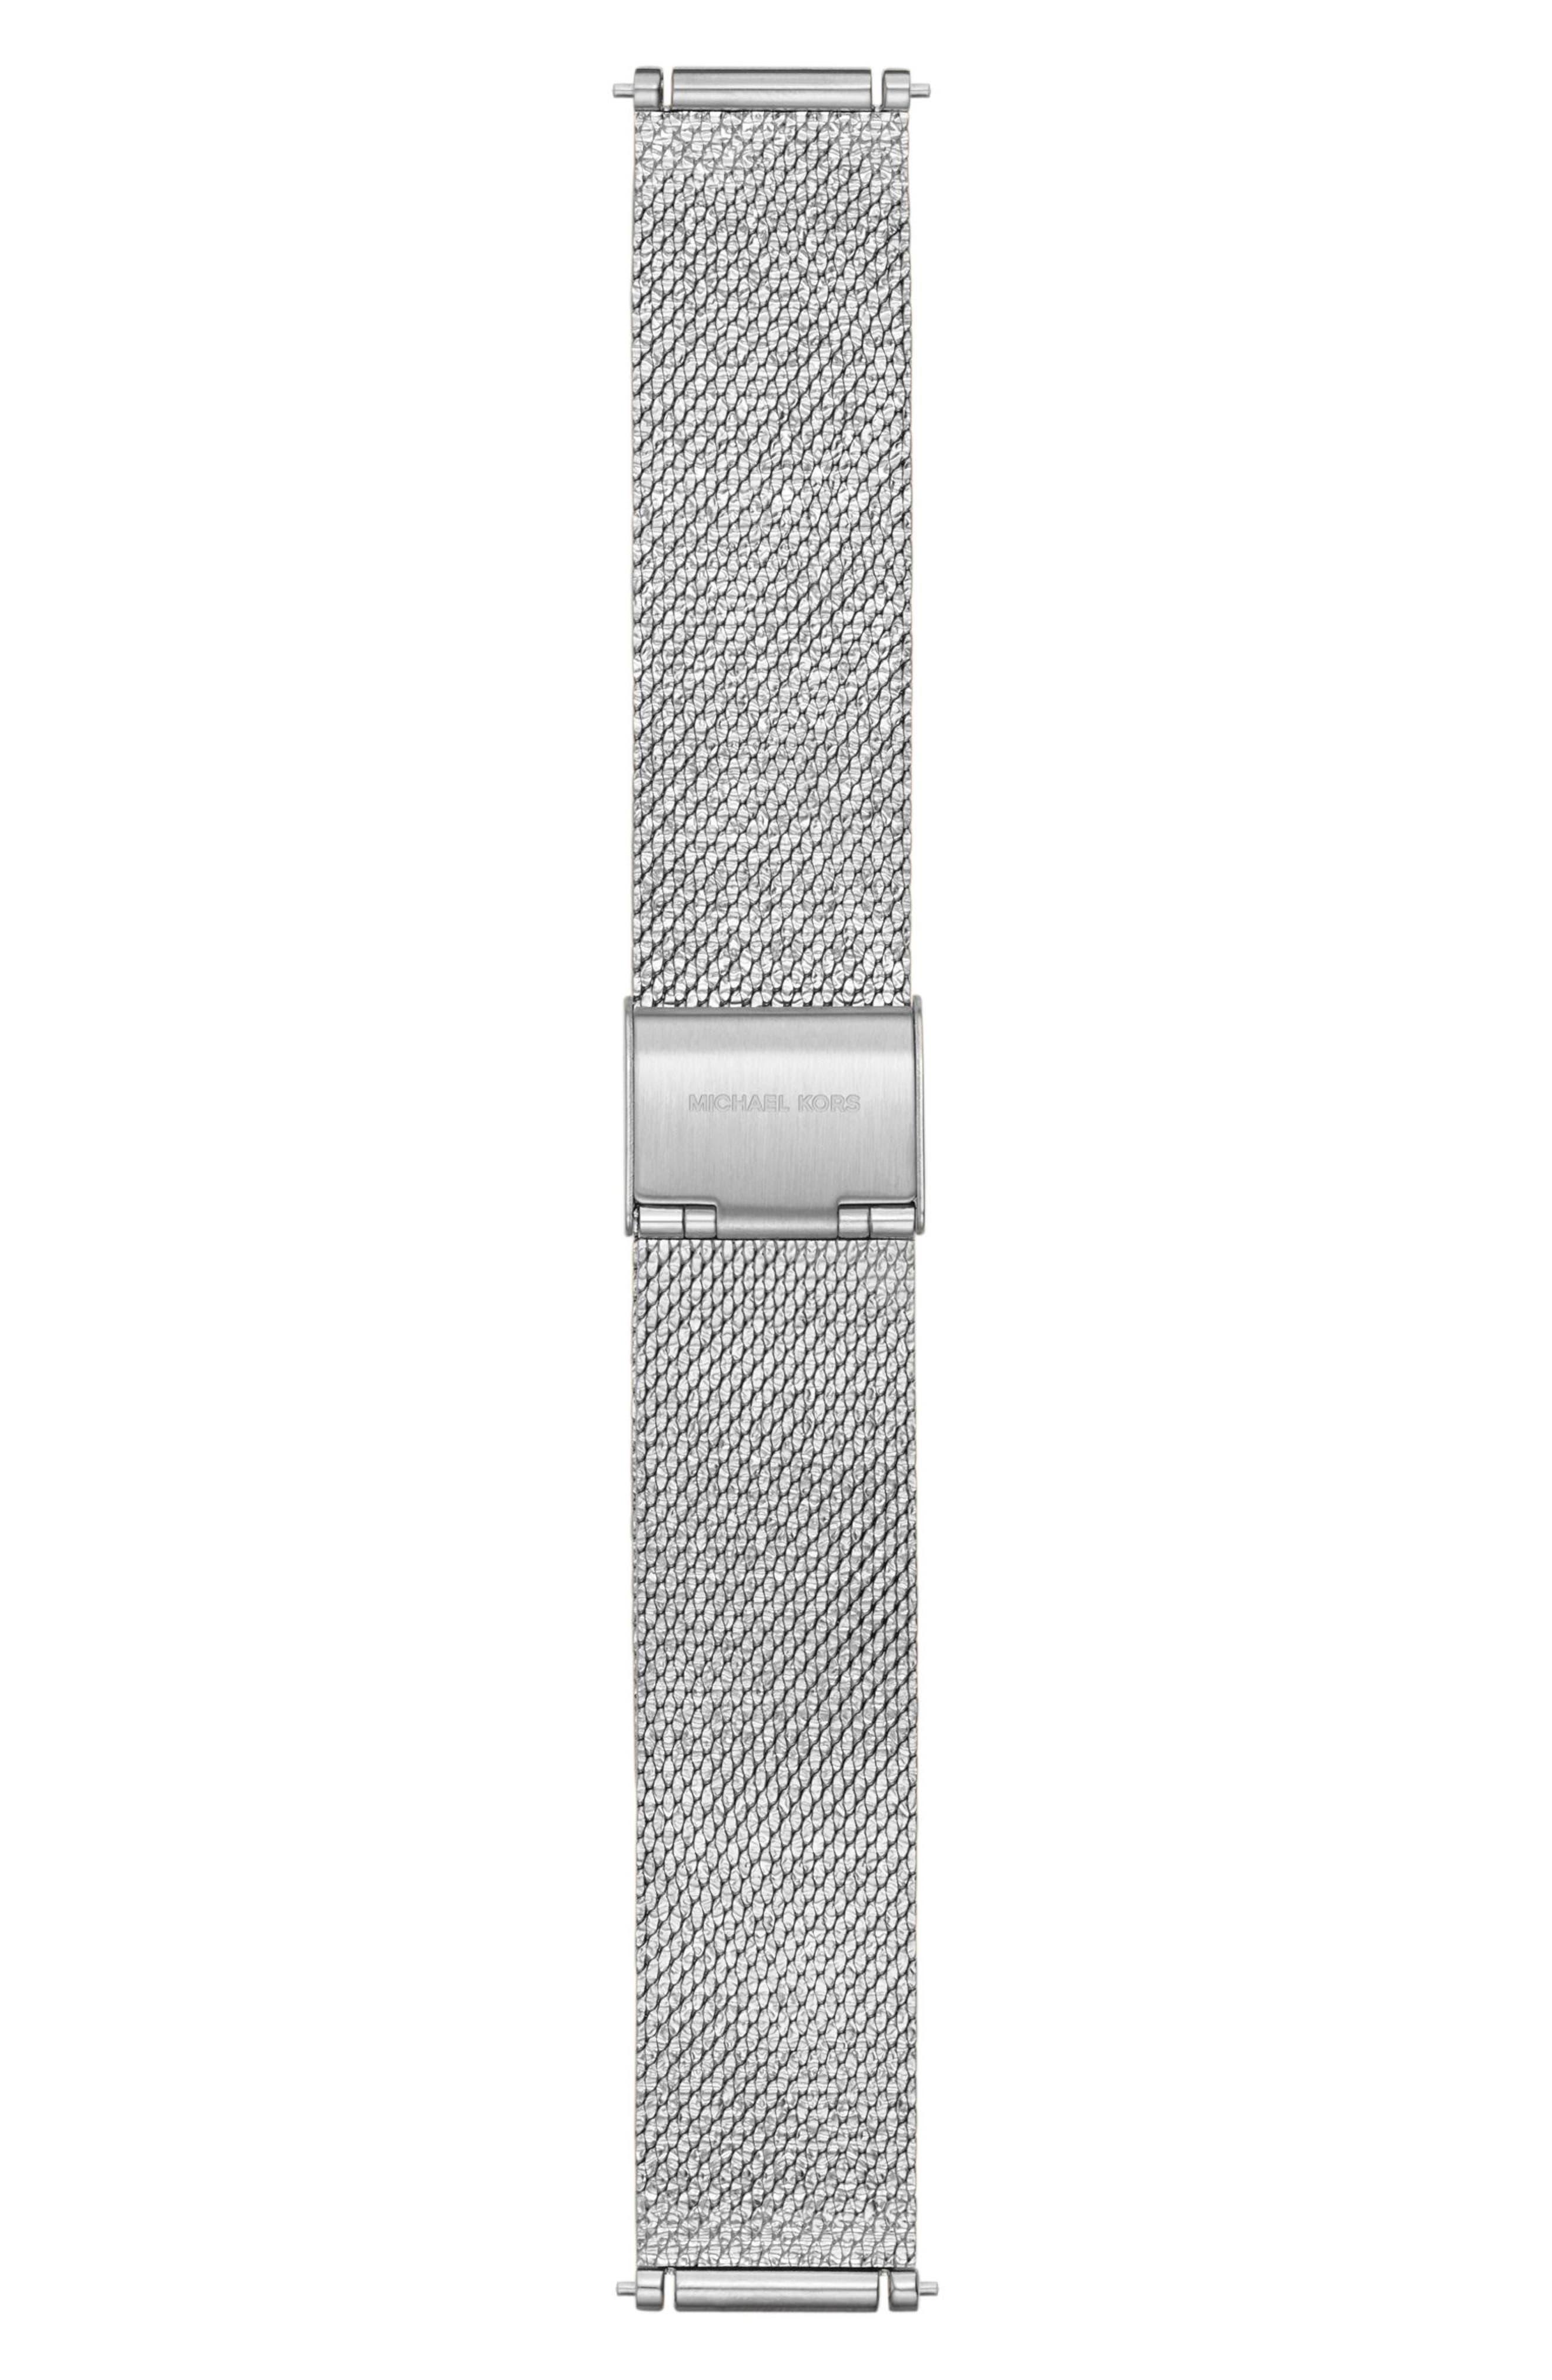 Main Image - Michael Kors Access Sofie 18mm Mesh Watch Strap